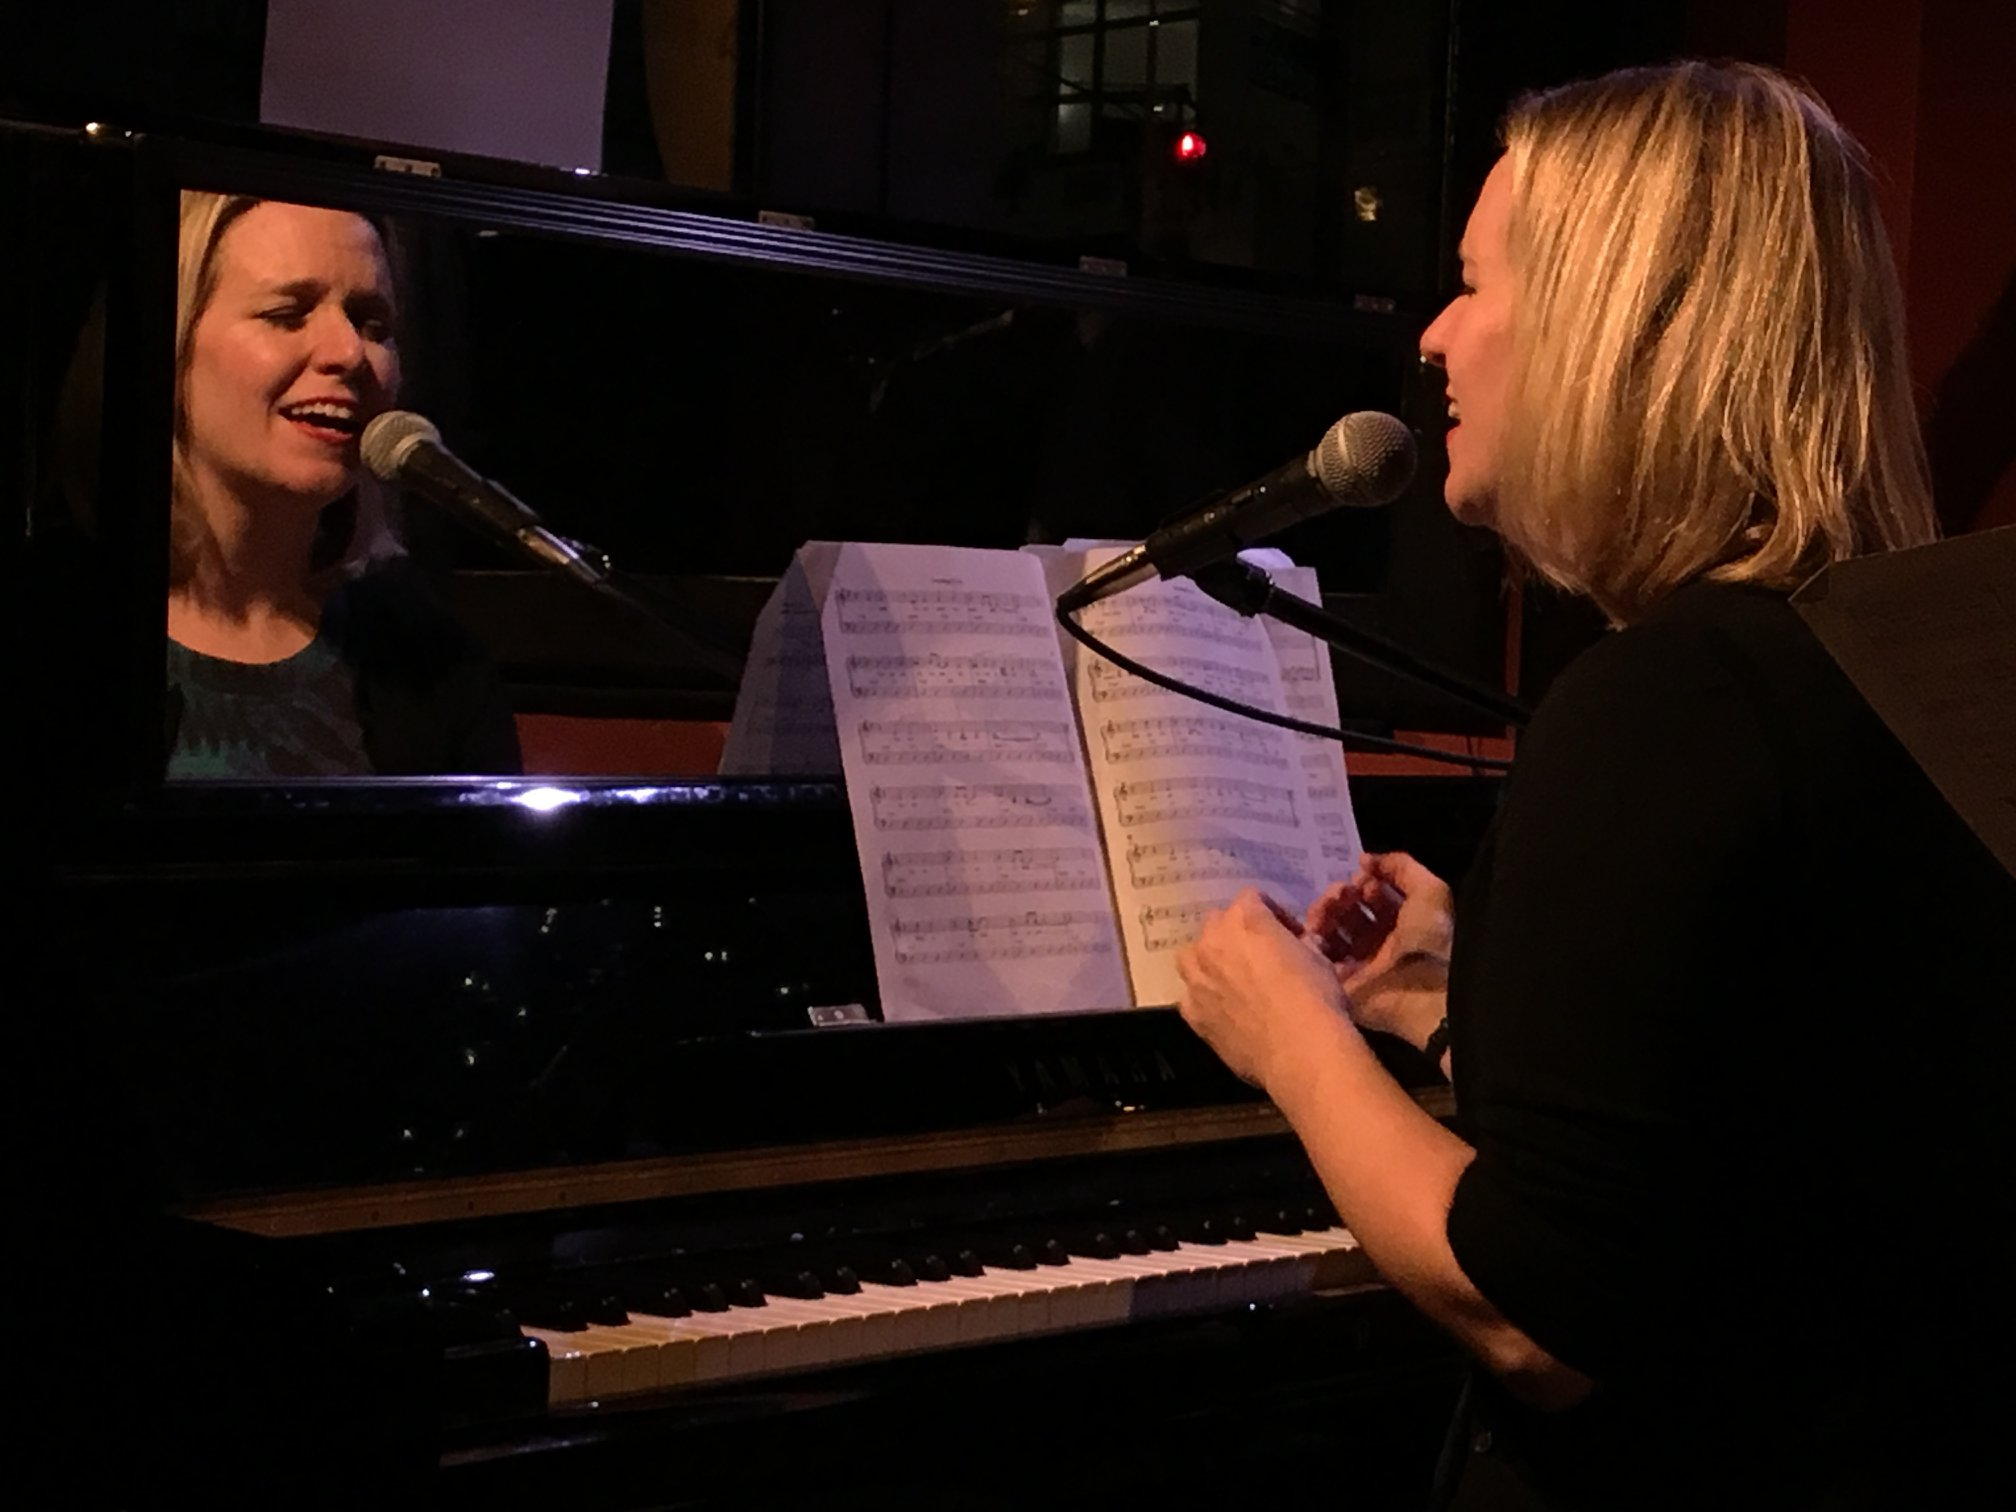 Brenda singing and playing piano